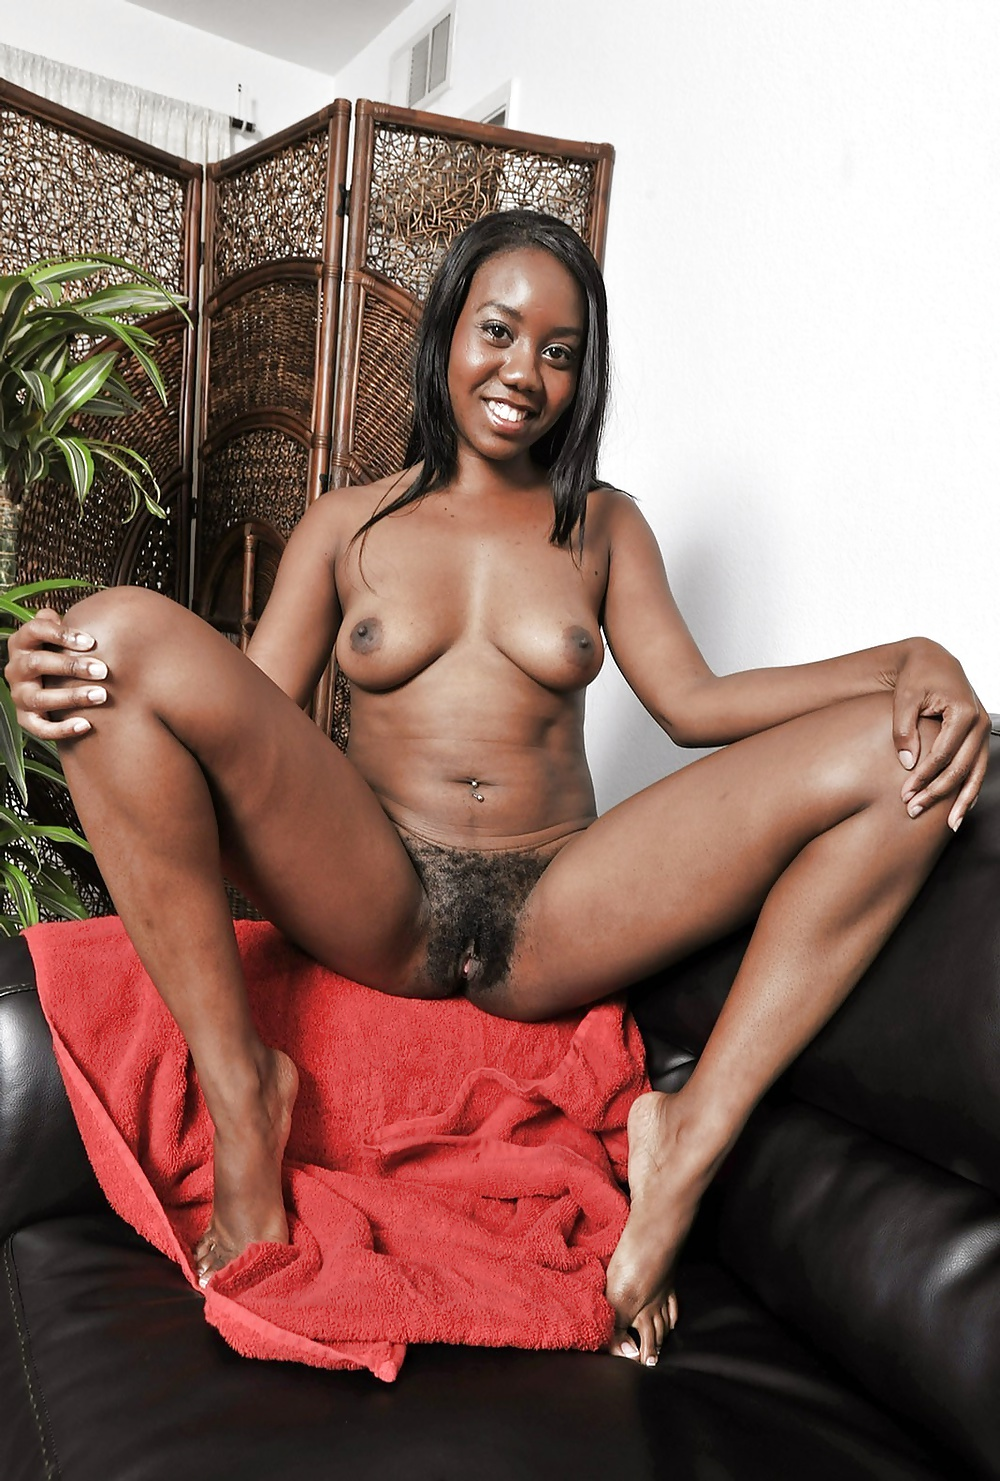 Nina devon nude pics — photo 10